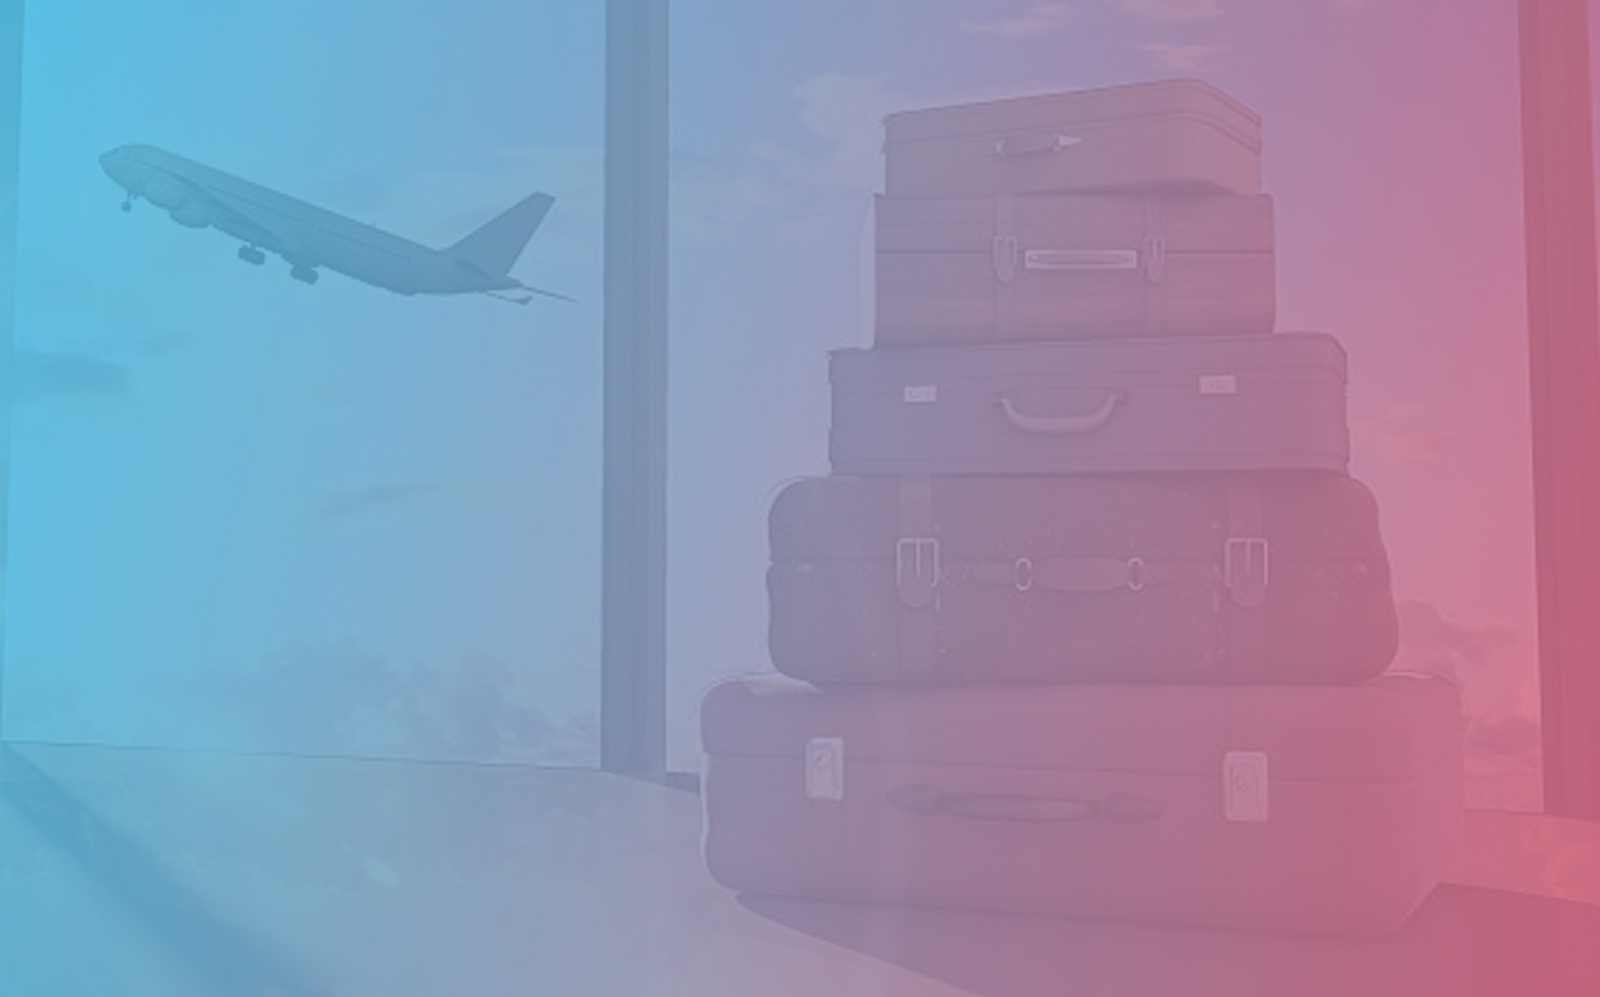 nocrm-email-retargeting-travel-sample